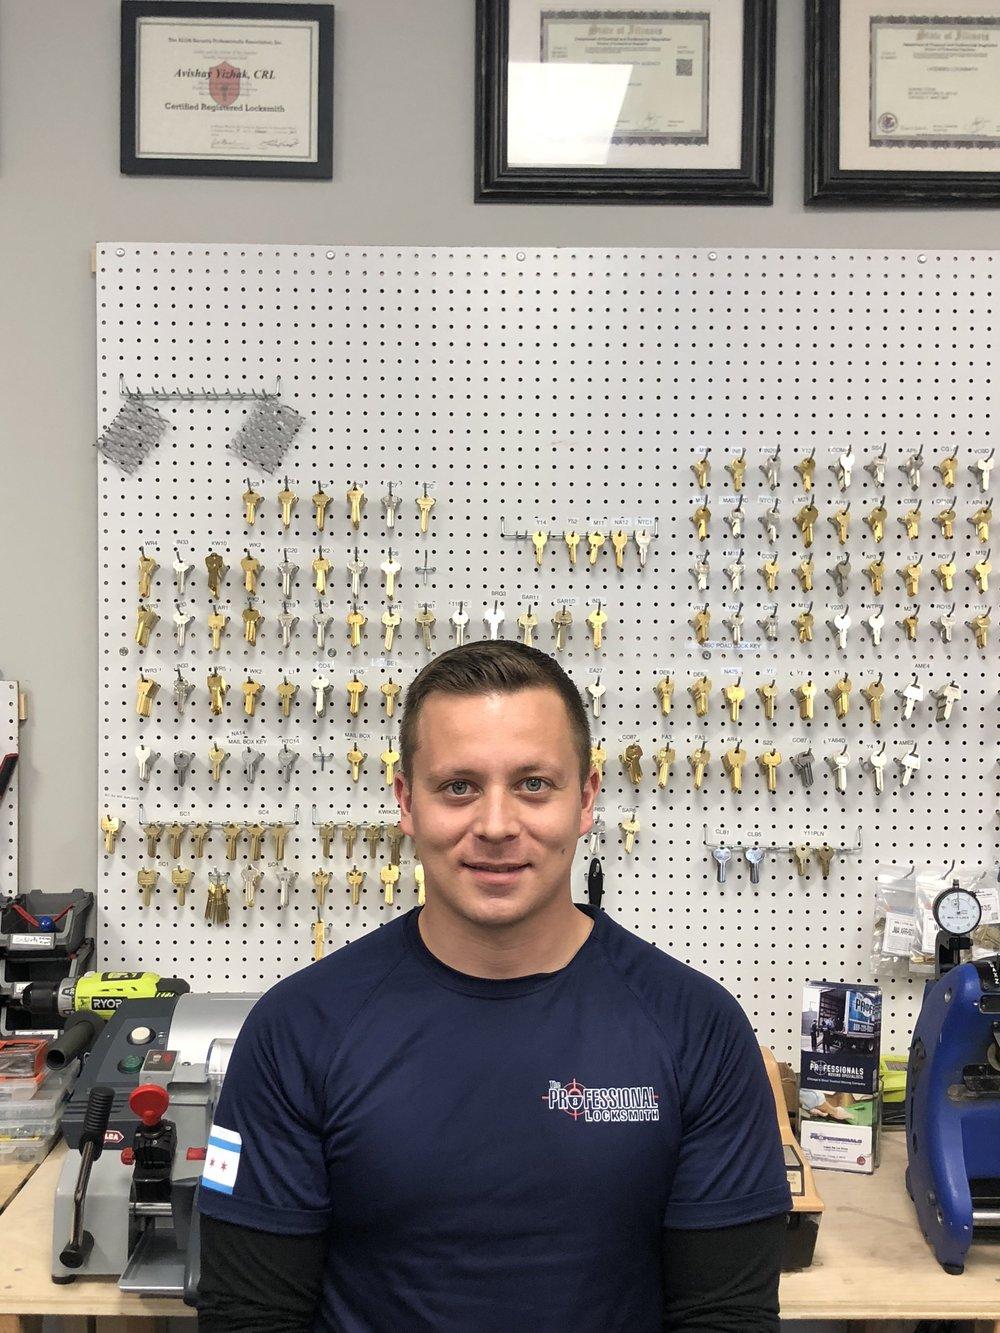 Joshua A - locksmith technician at The Professional Locksmith